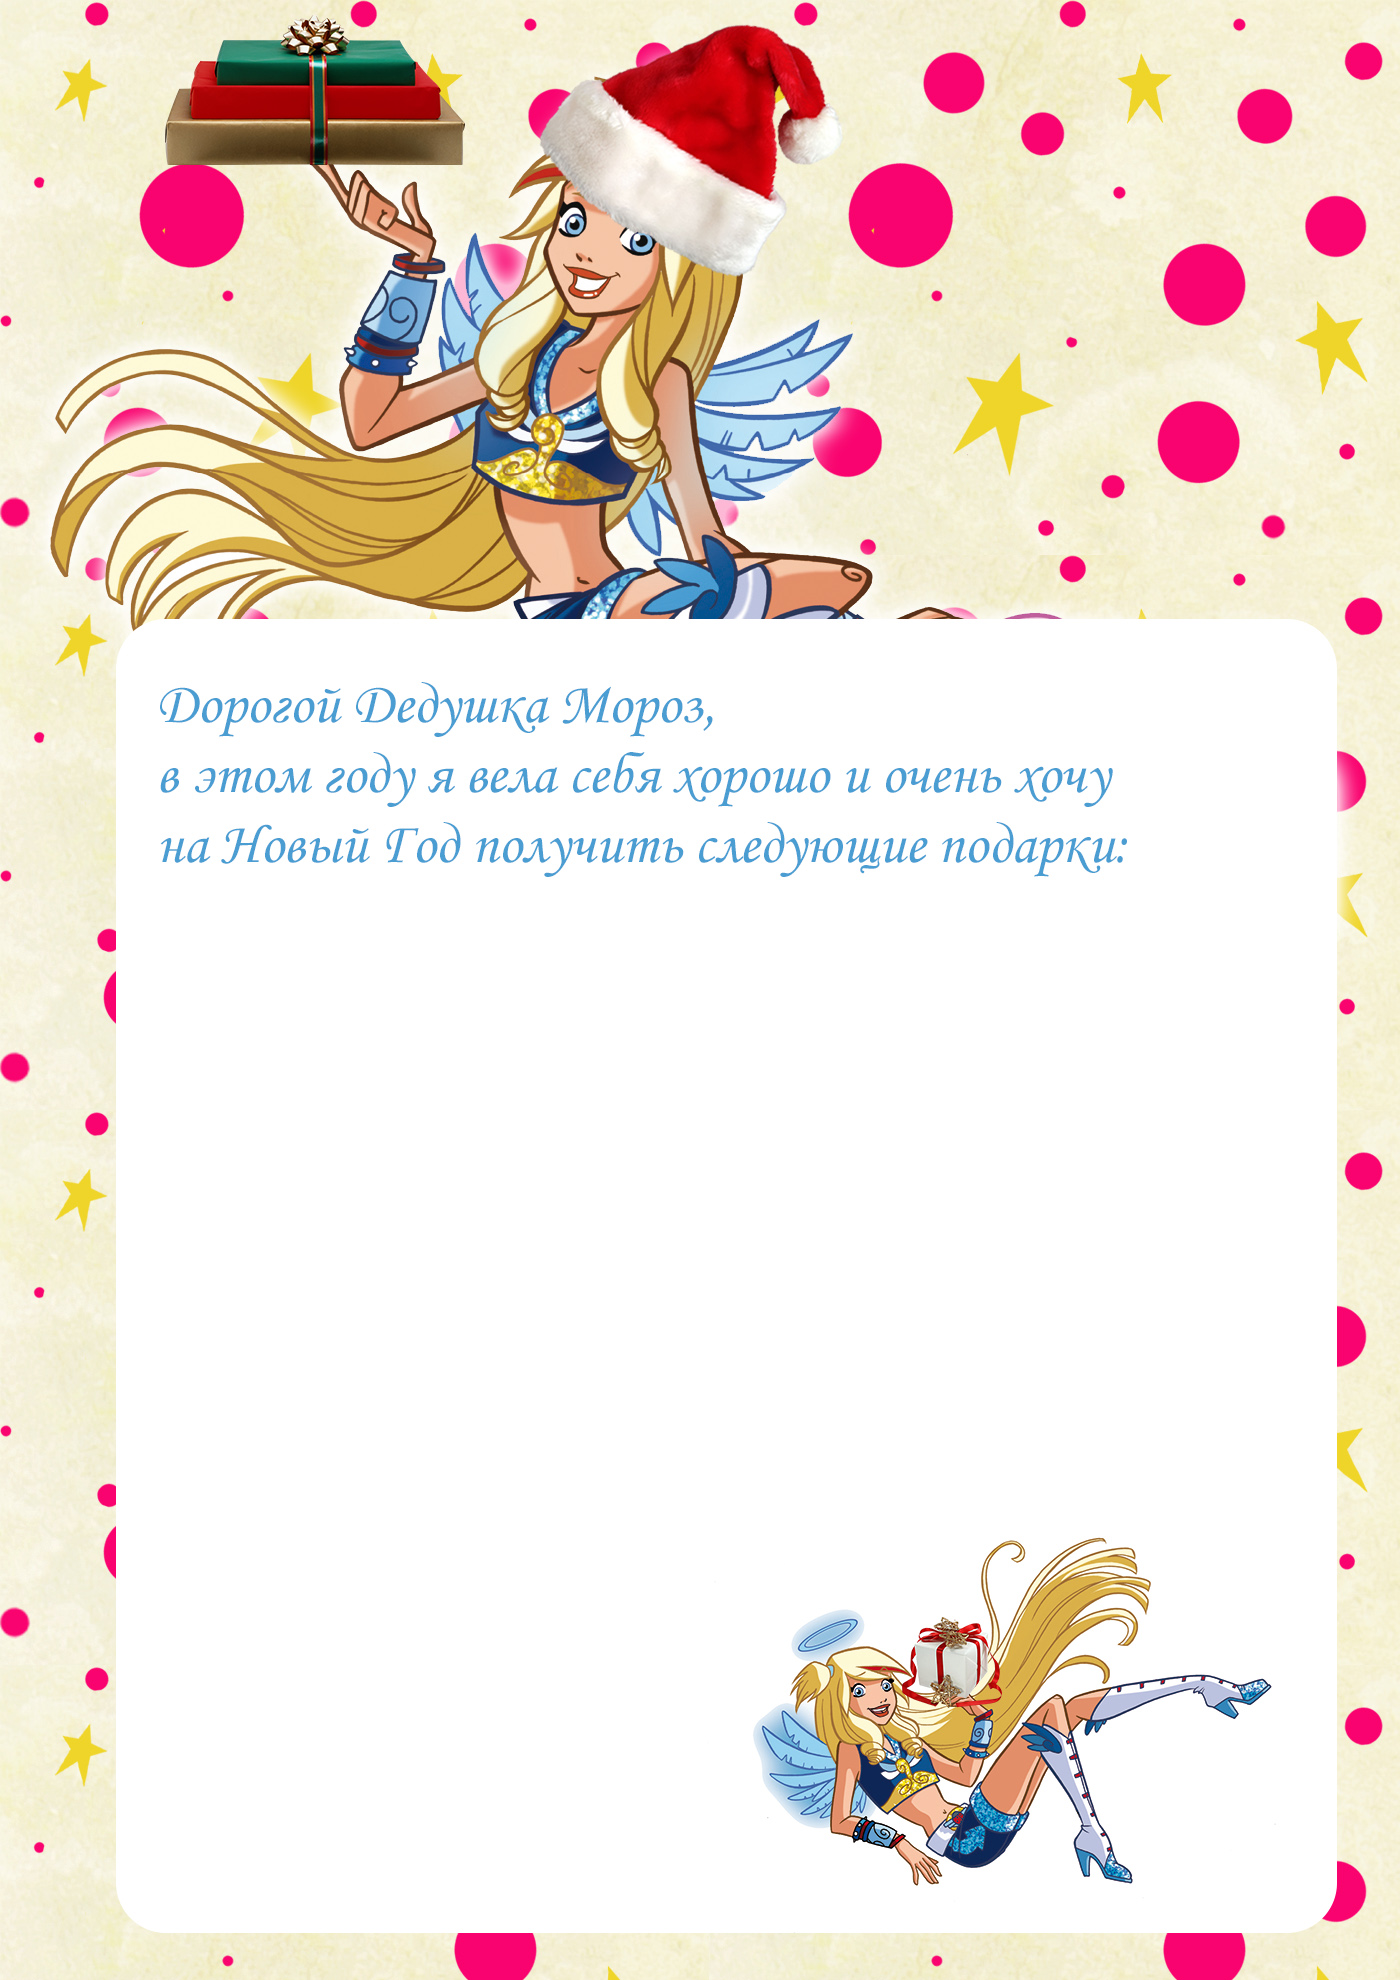 специально для пользователей сайта ...: www.youloveit.ru/mult/mult_interes/angelsfriends_interes/print:page...